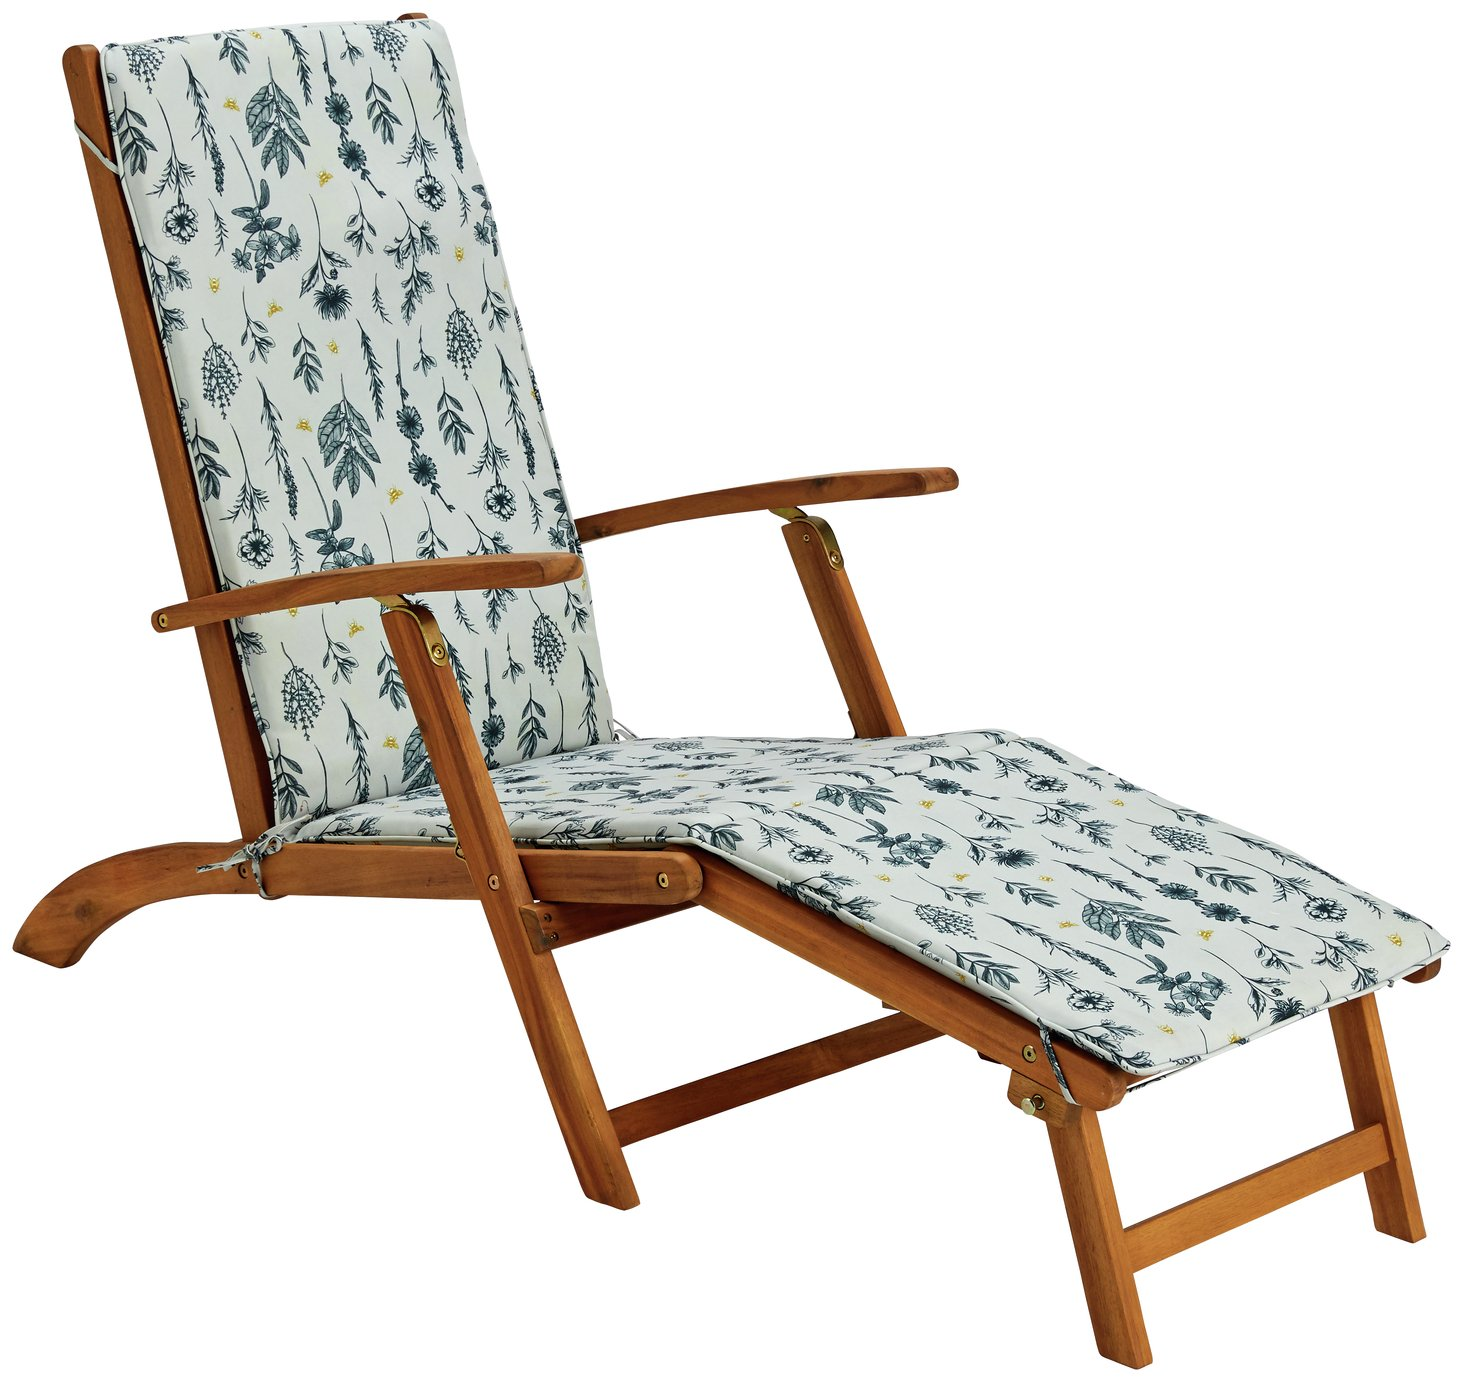 beach chairs uk argos outside chair lifts garden sun loungers and